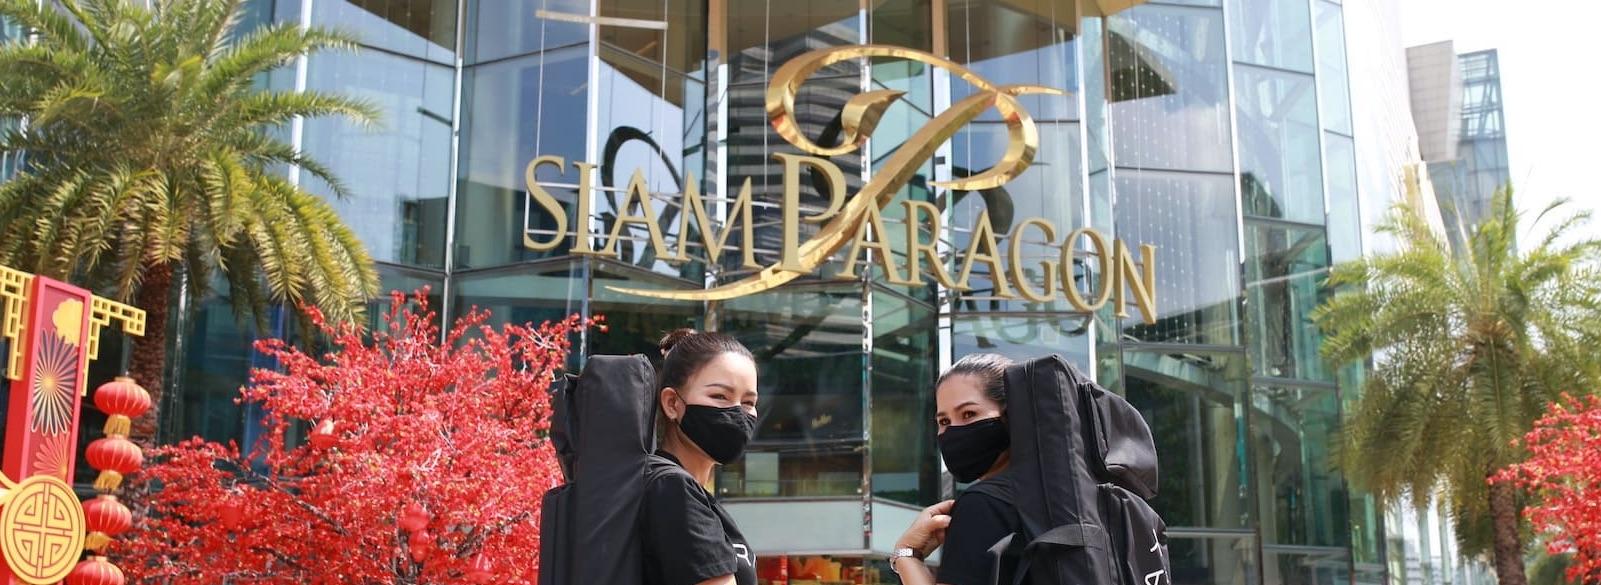 rlax-massage-bangkok-desktop